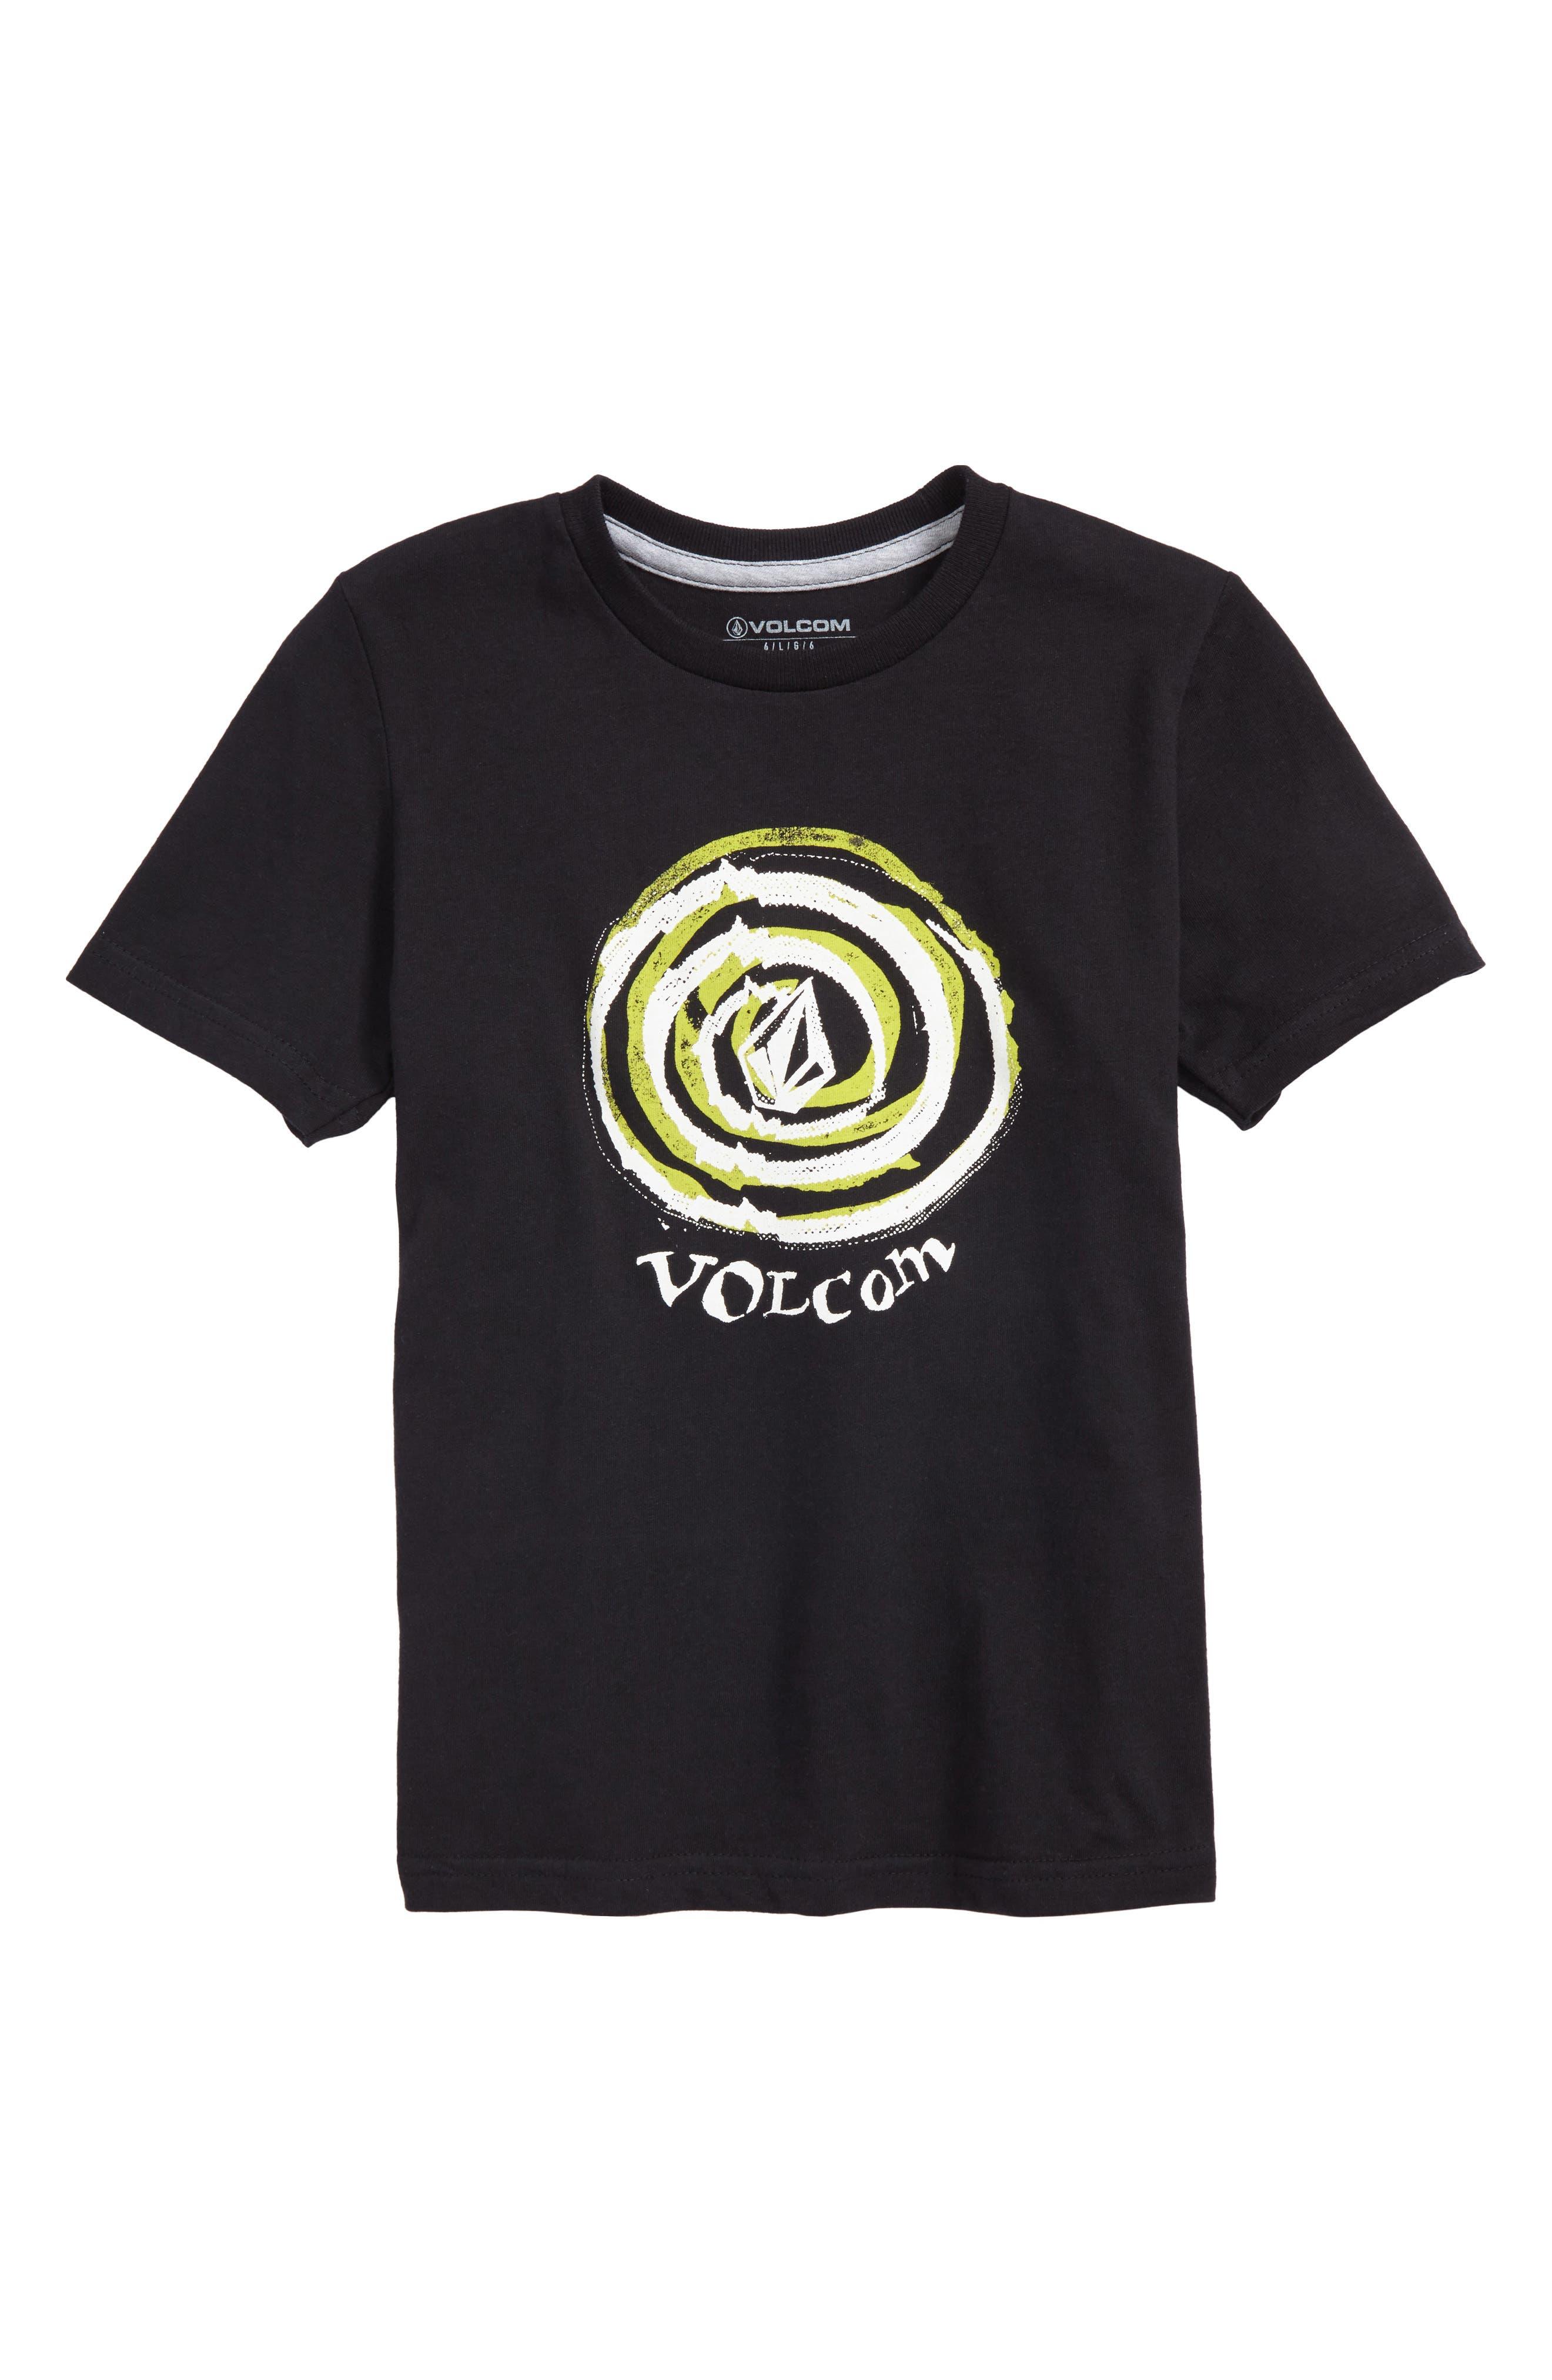 Volcom Comesaround Logo Graphic T-Shirt (Toddler Boys & Little Boys)